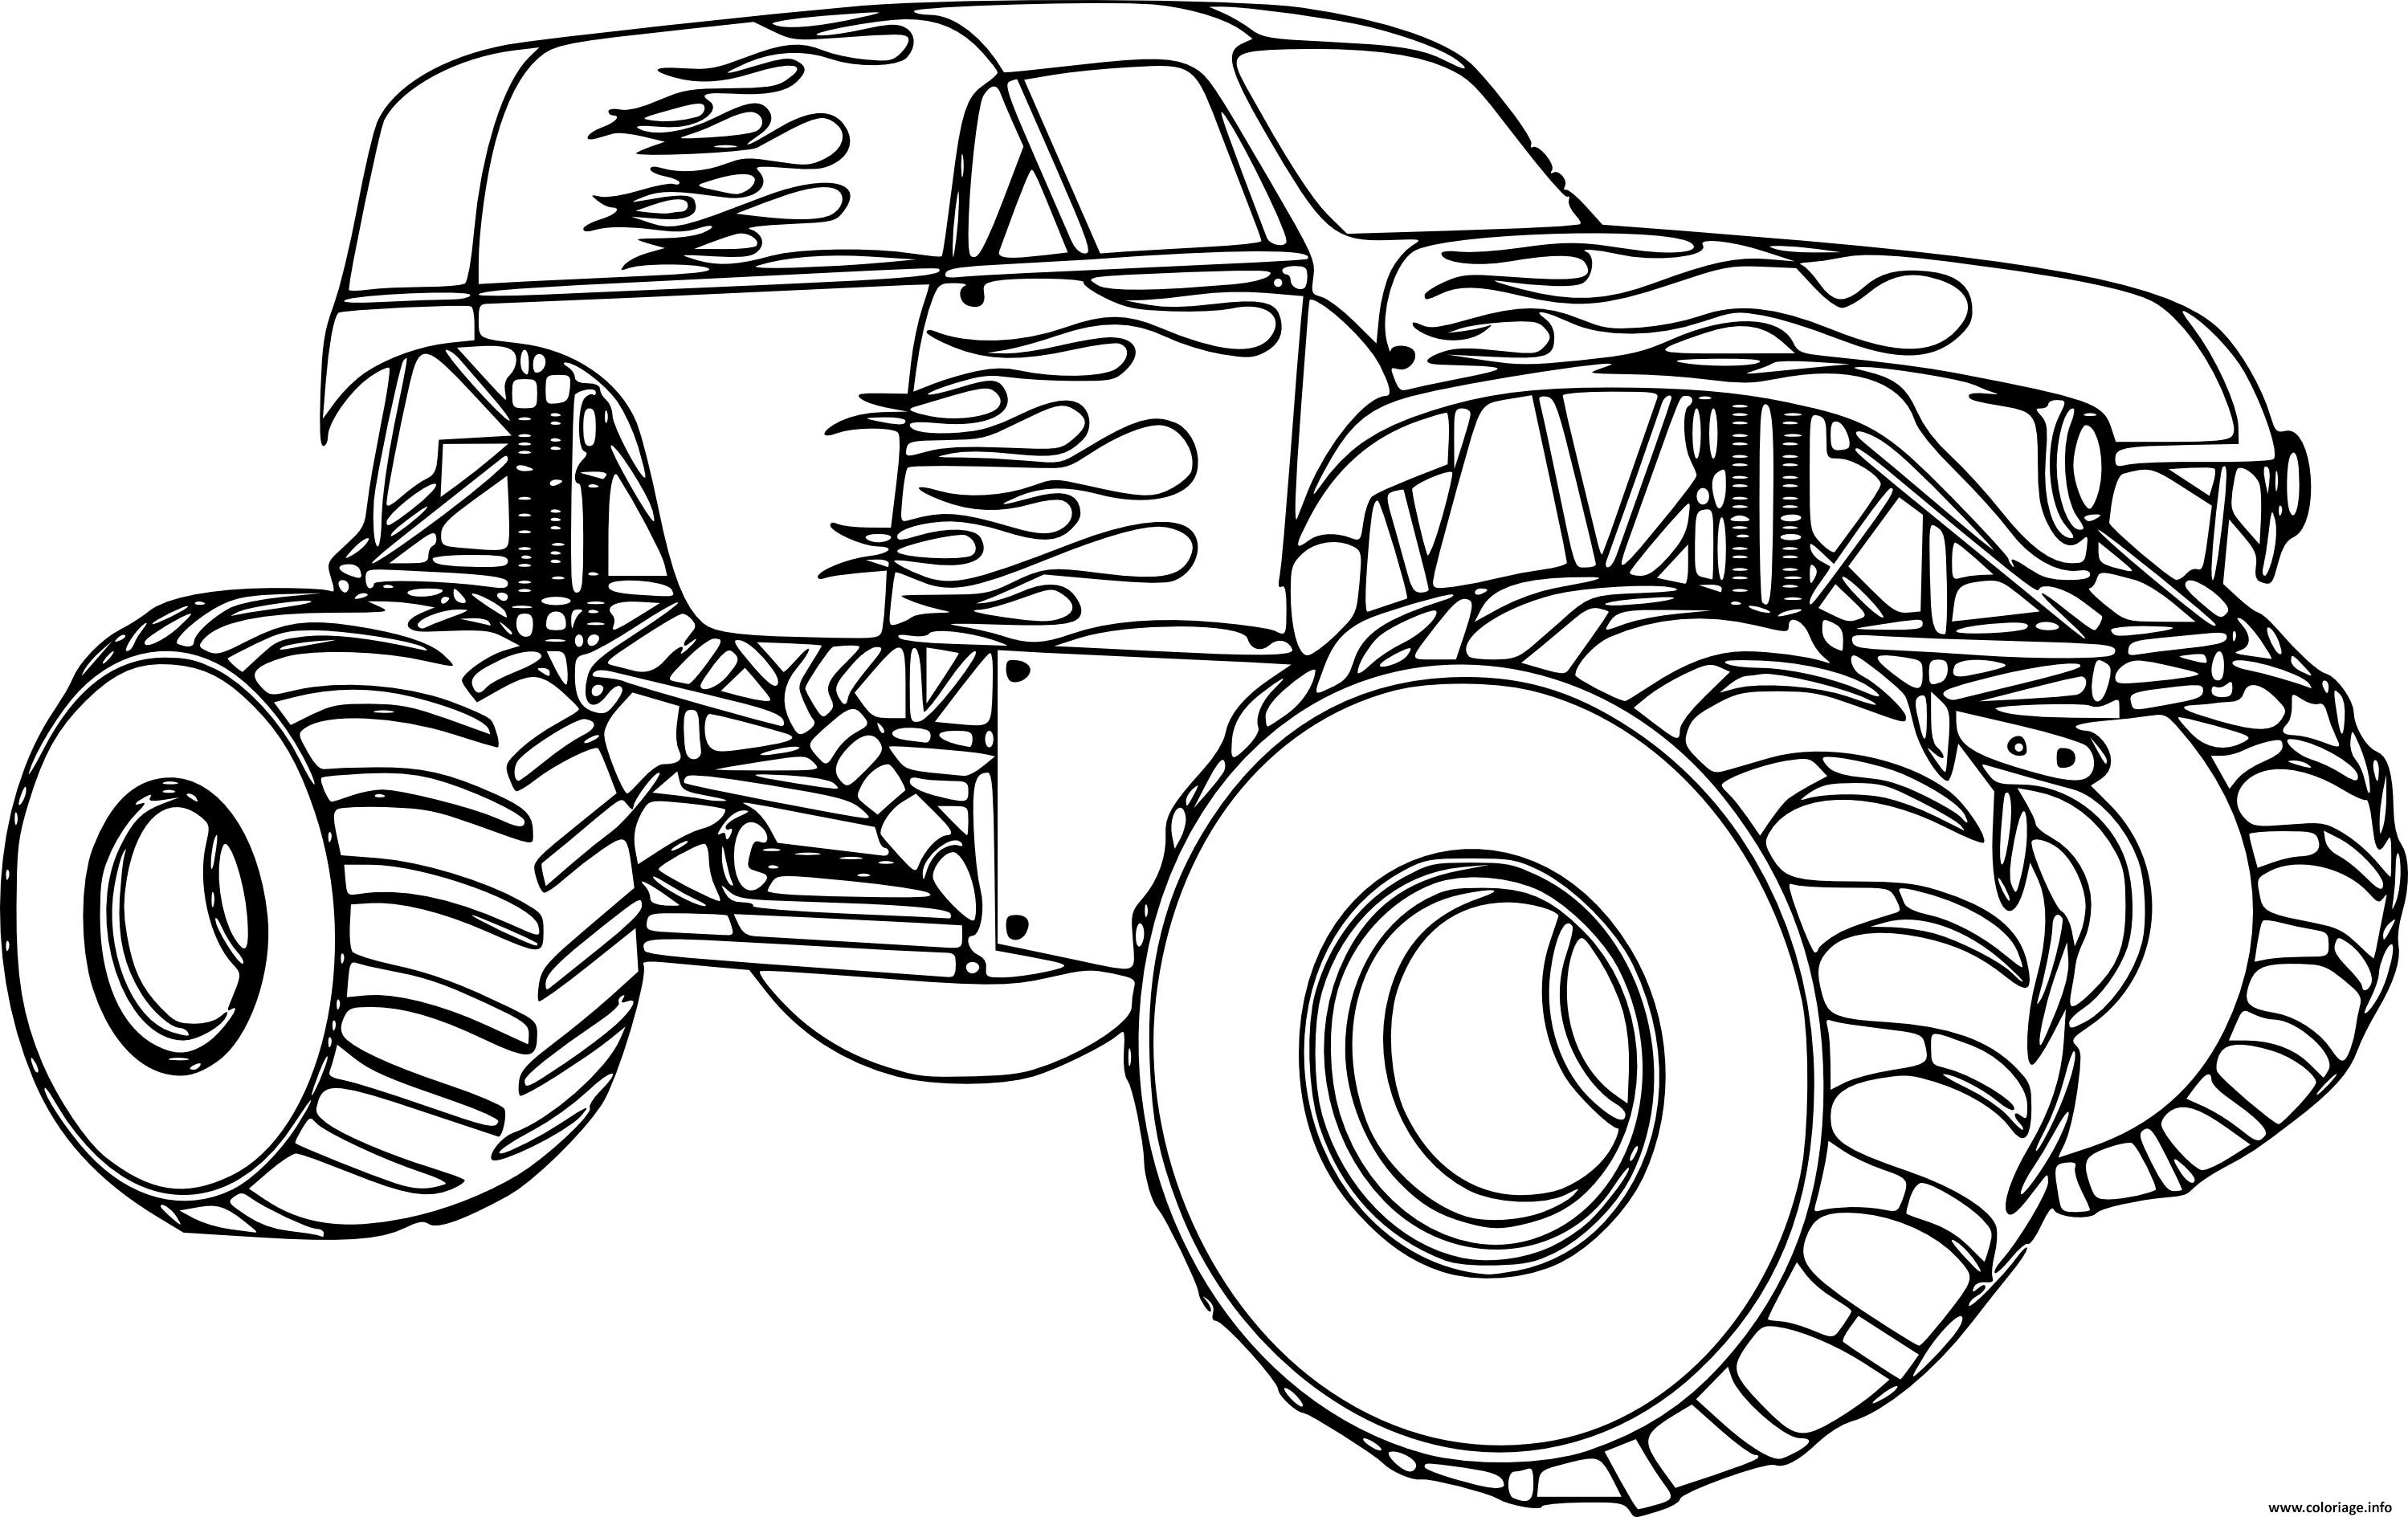 Coloriage Monster Truck Voiture 4x4 Garcon Dessin Garcon à ...